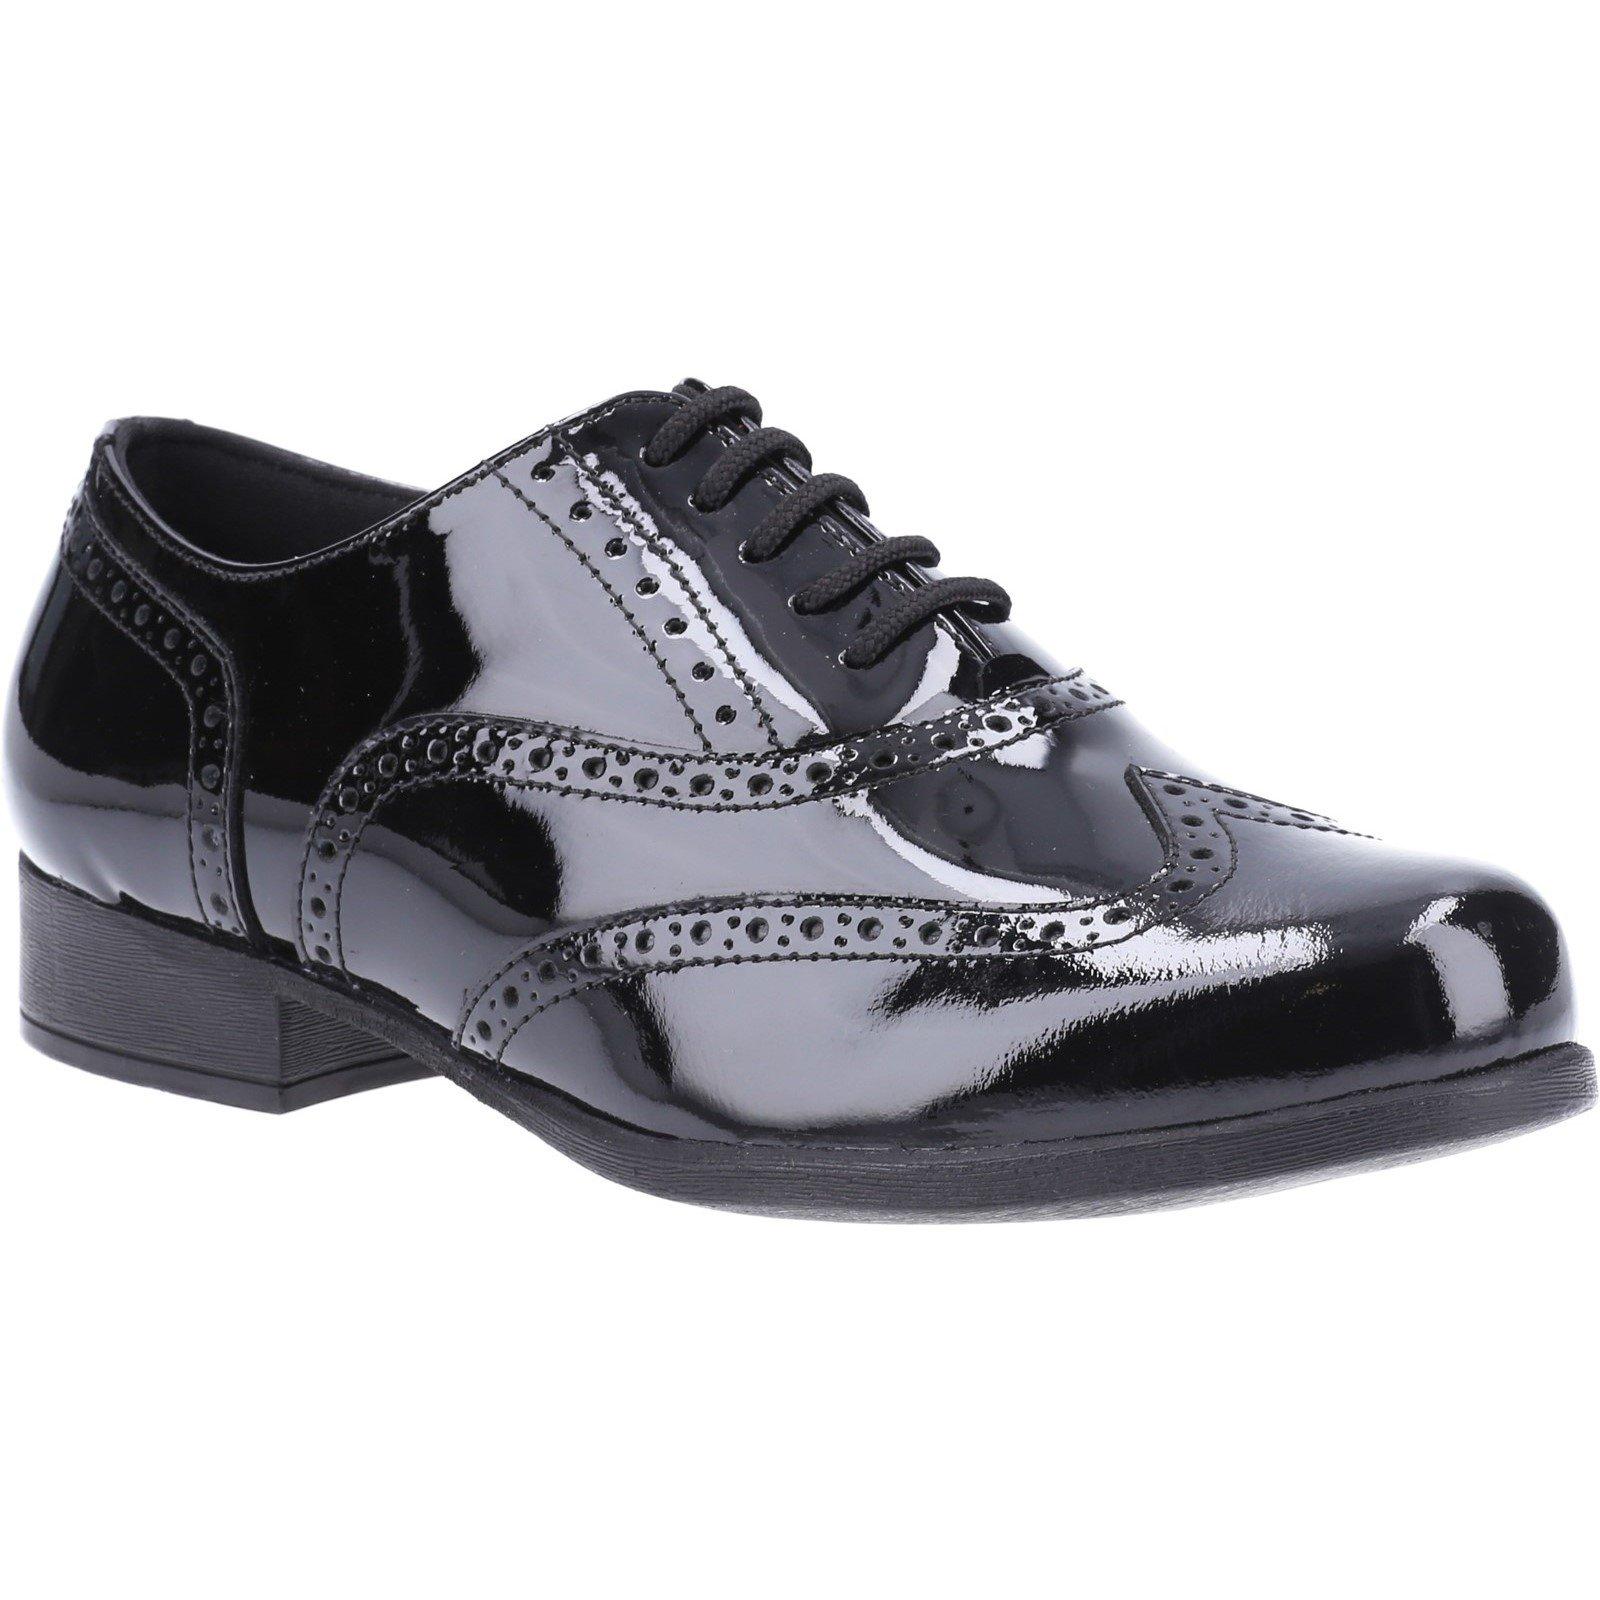 Hush Puppies Kid's Kada Junior School Brogue Shoe Patent Black 32597 - Patent Black 2